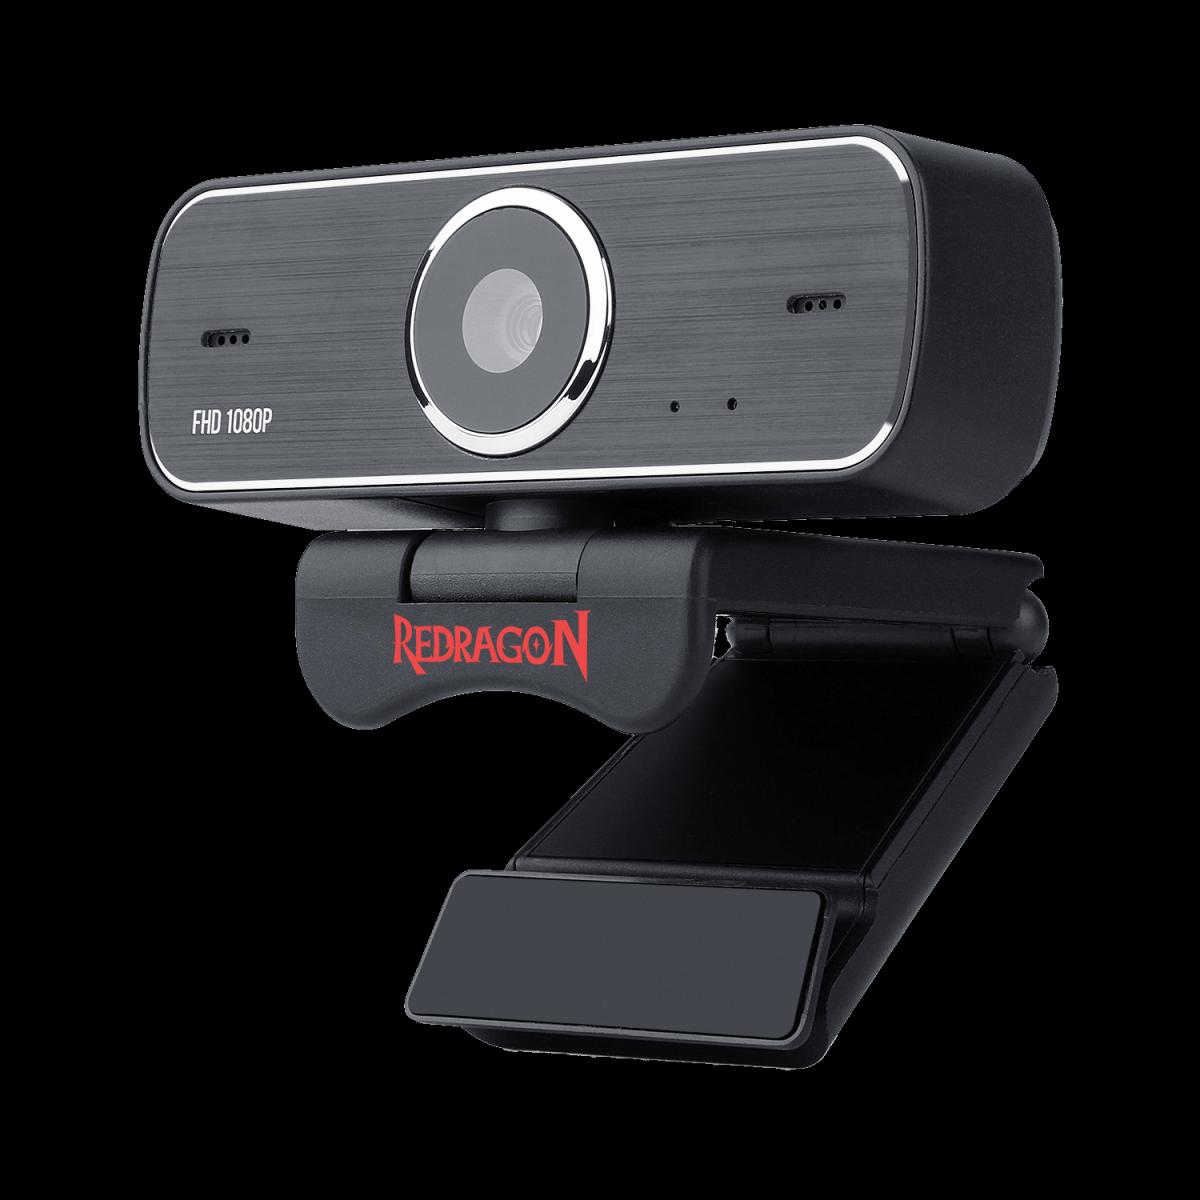 WebCam Redragon Hitman, FullHD, 1080p, GW800